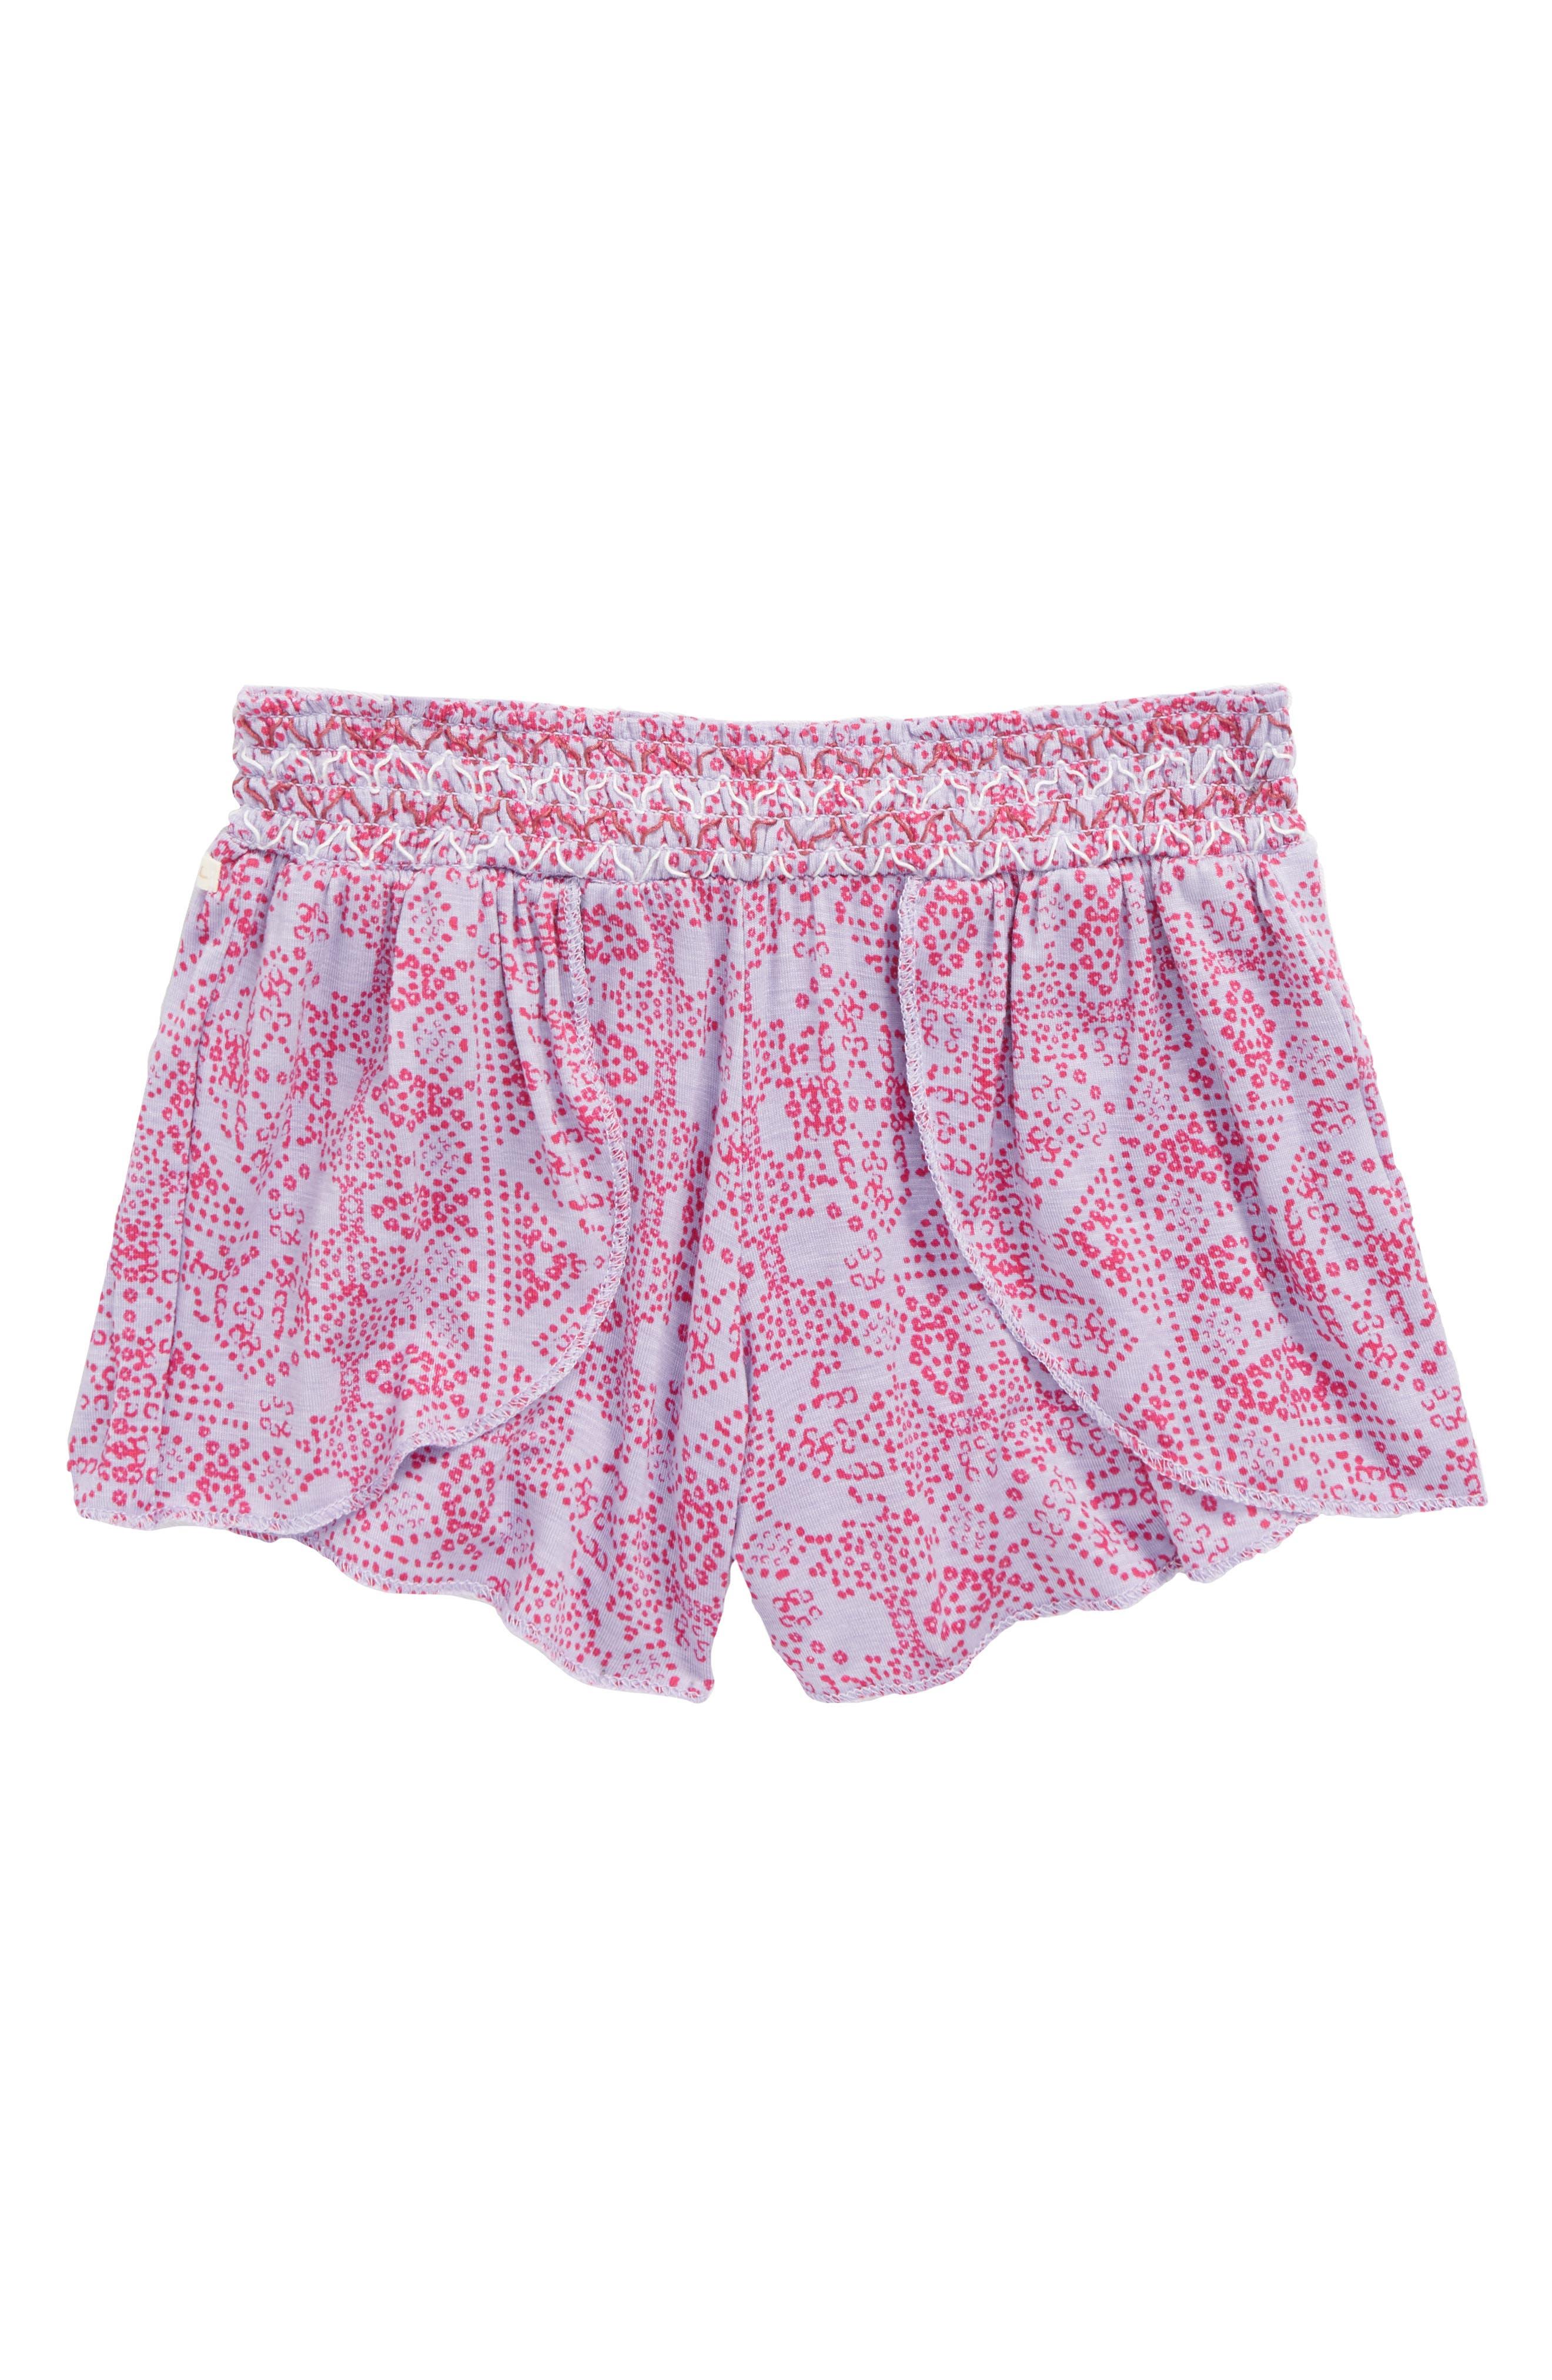 Dulce Smocked Shorts,                             Main thumbnail 1, color,                             Heriloom Lilac - Lav